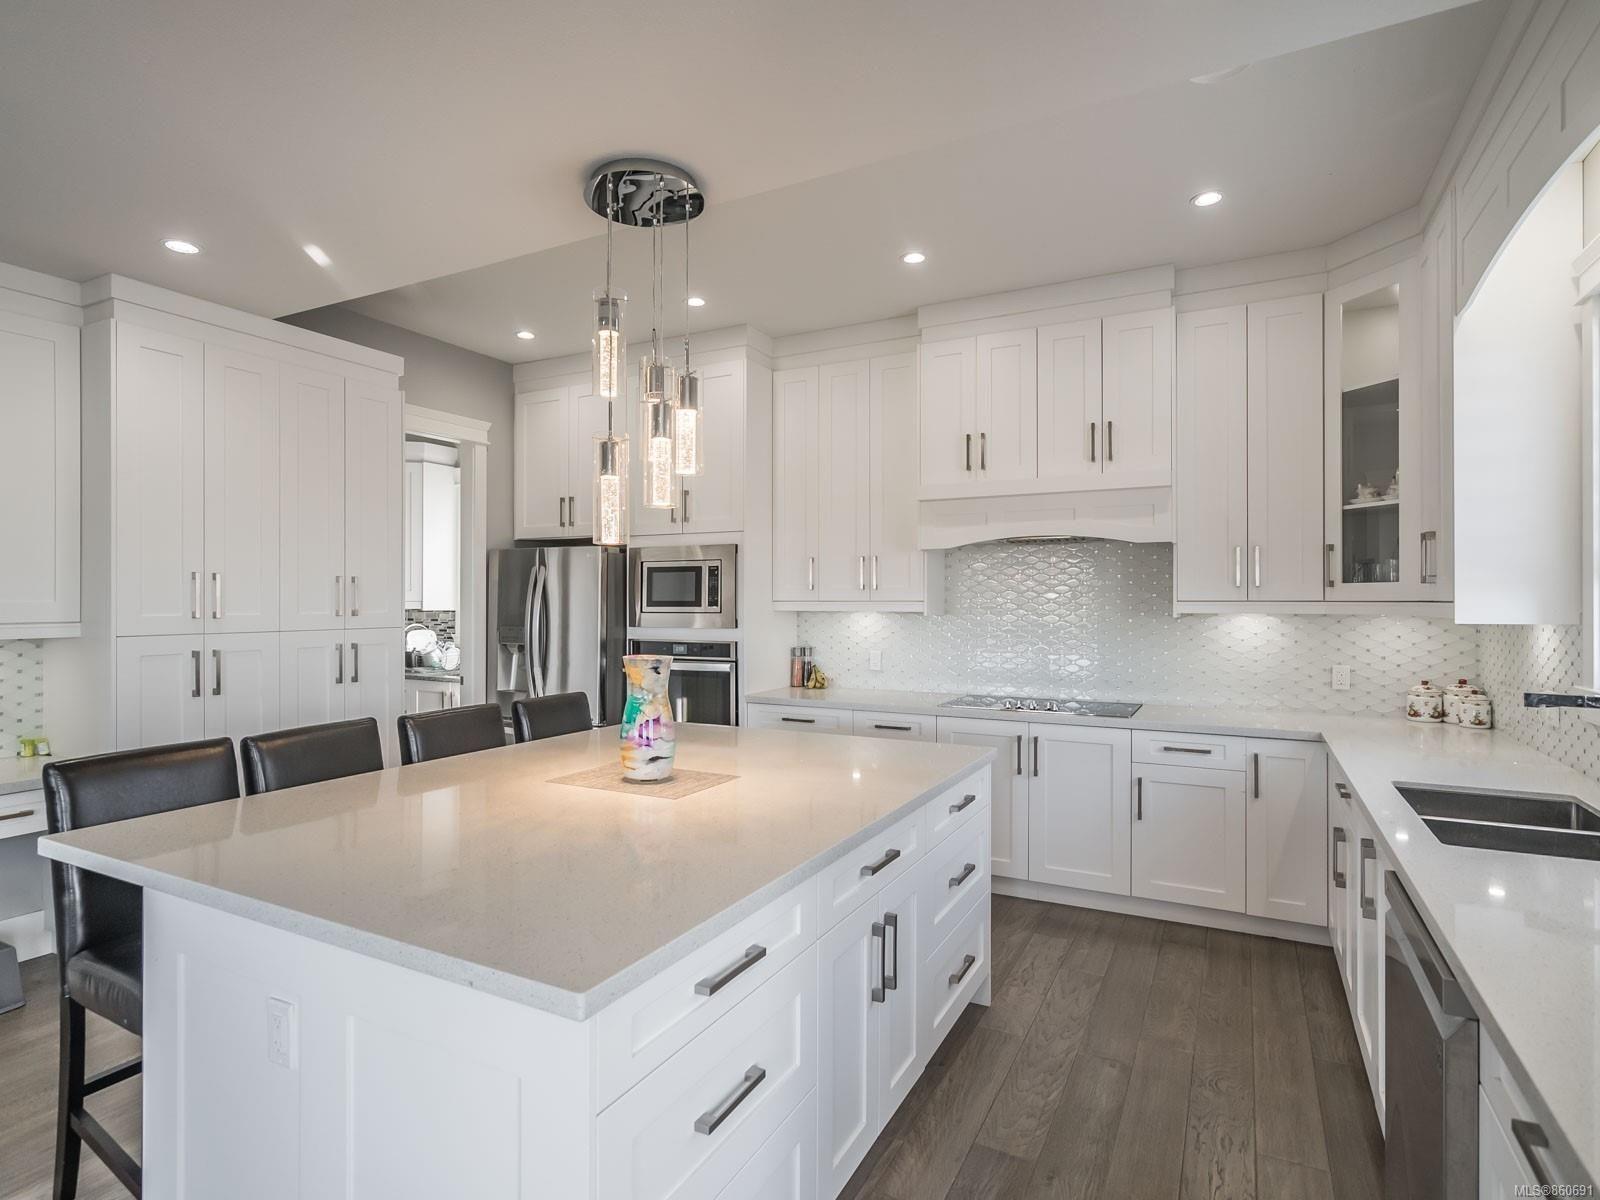 Photo 11: Photos: 5821 Linley Valley Dr in : Na North Nanaimo House for sale (Nanaimo)  : MLS®# 860691